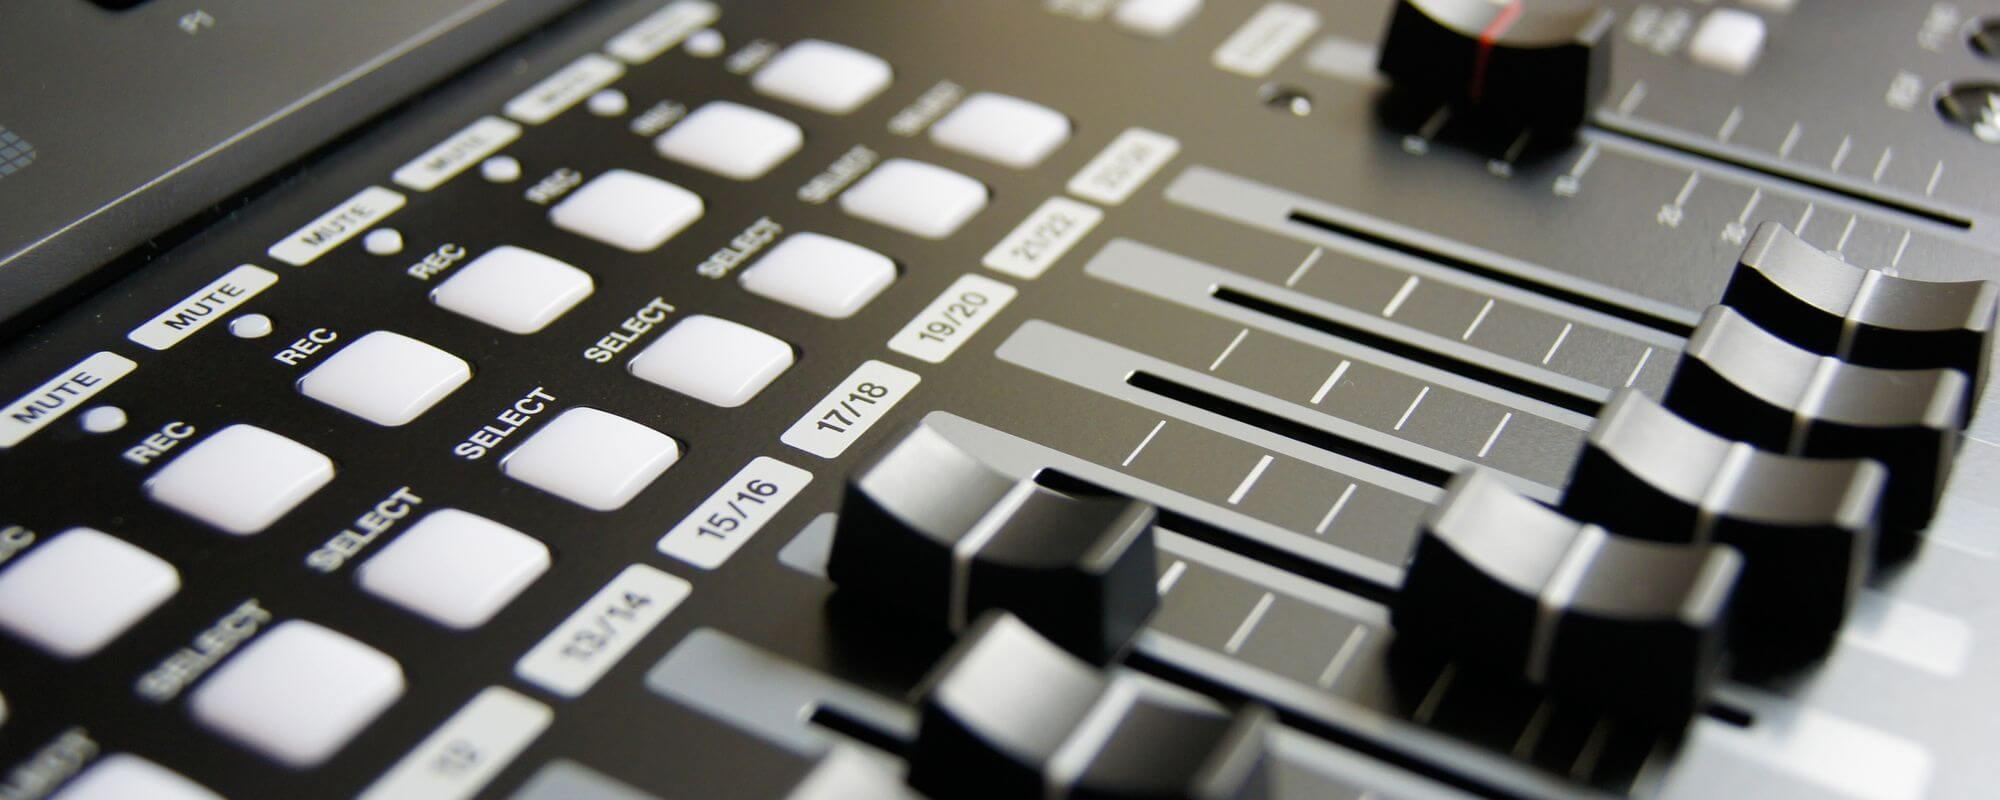 Detaliu audio mixer